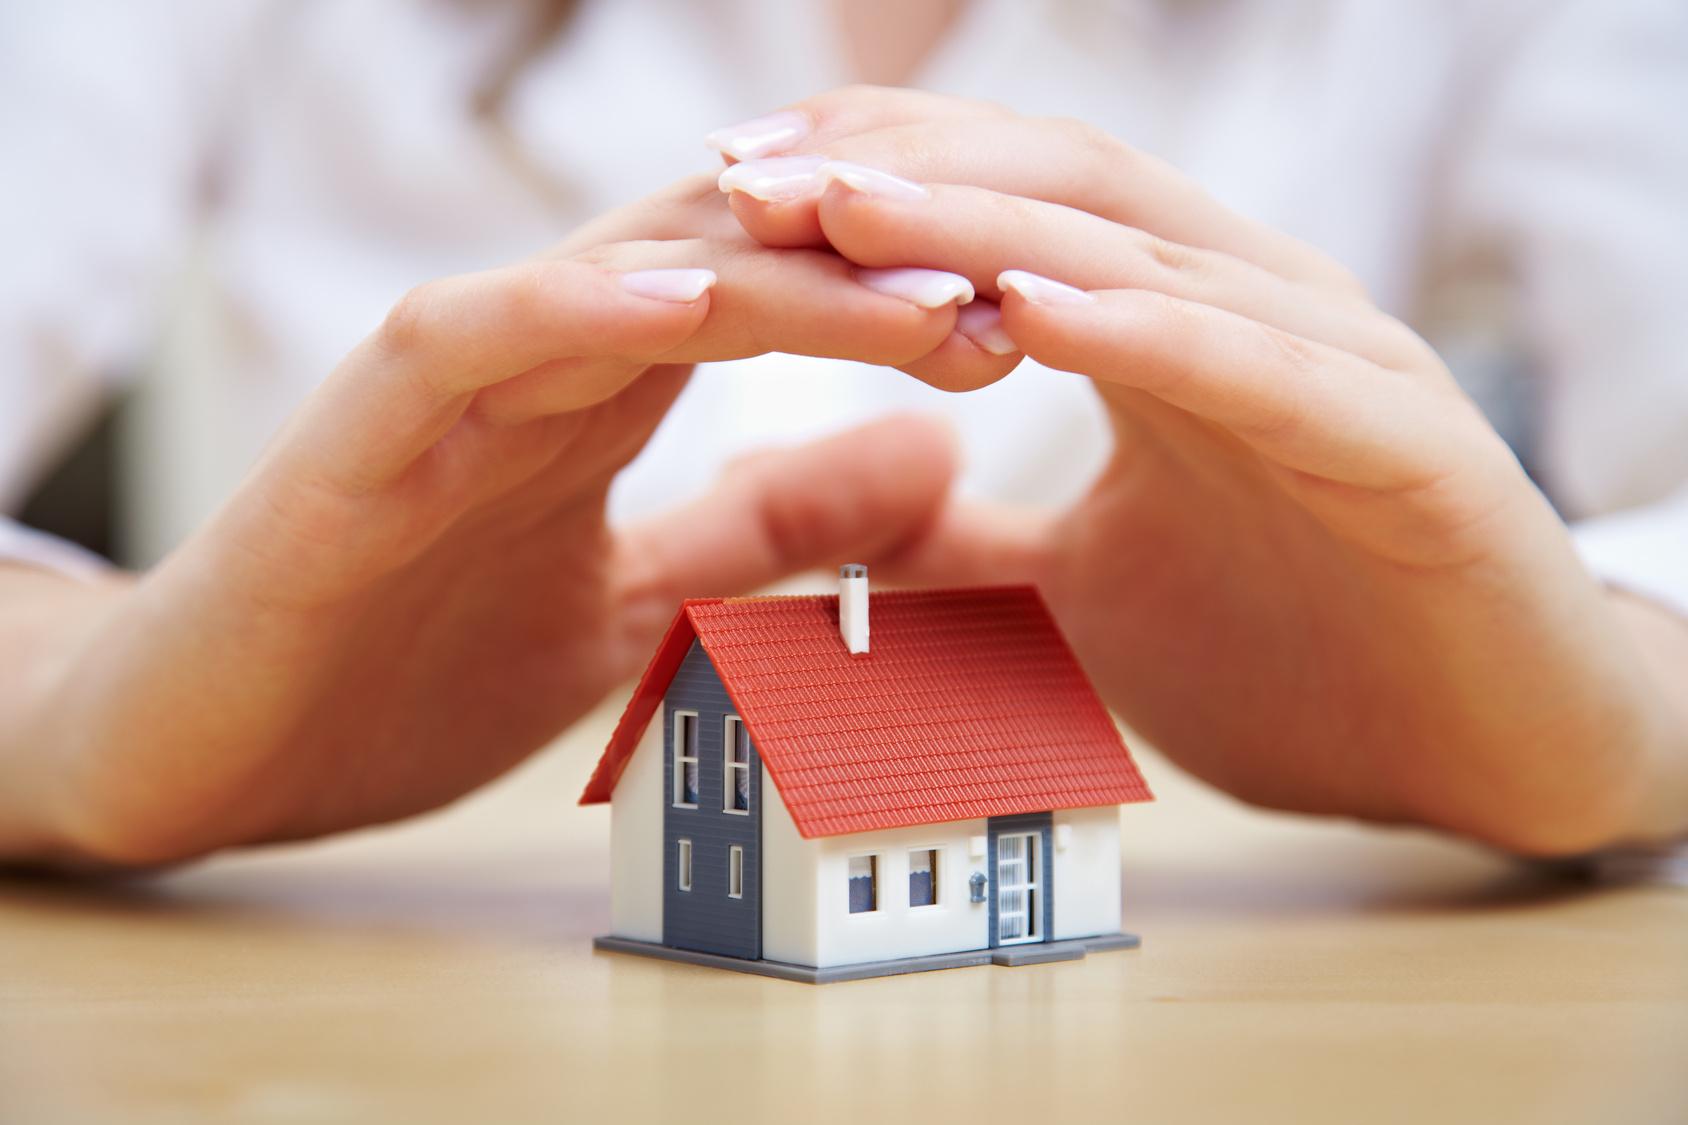 «Билайн» защитит ваш дом по программе «Хоть Потоп!+»